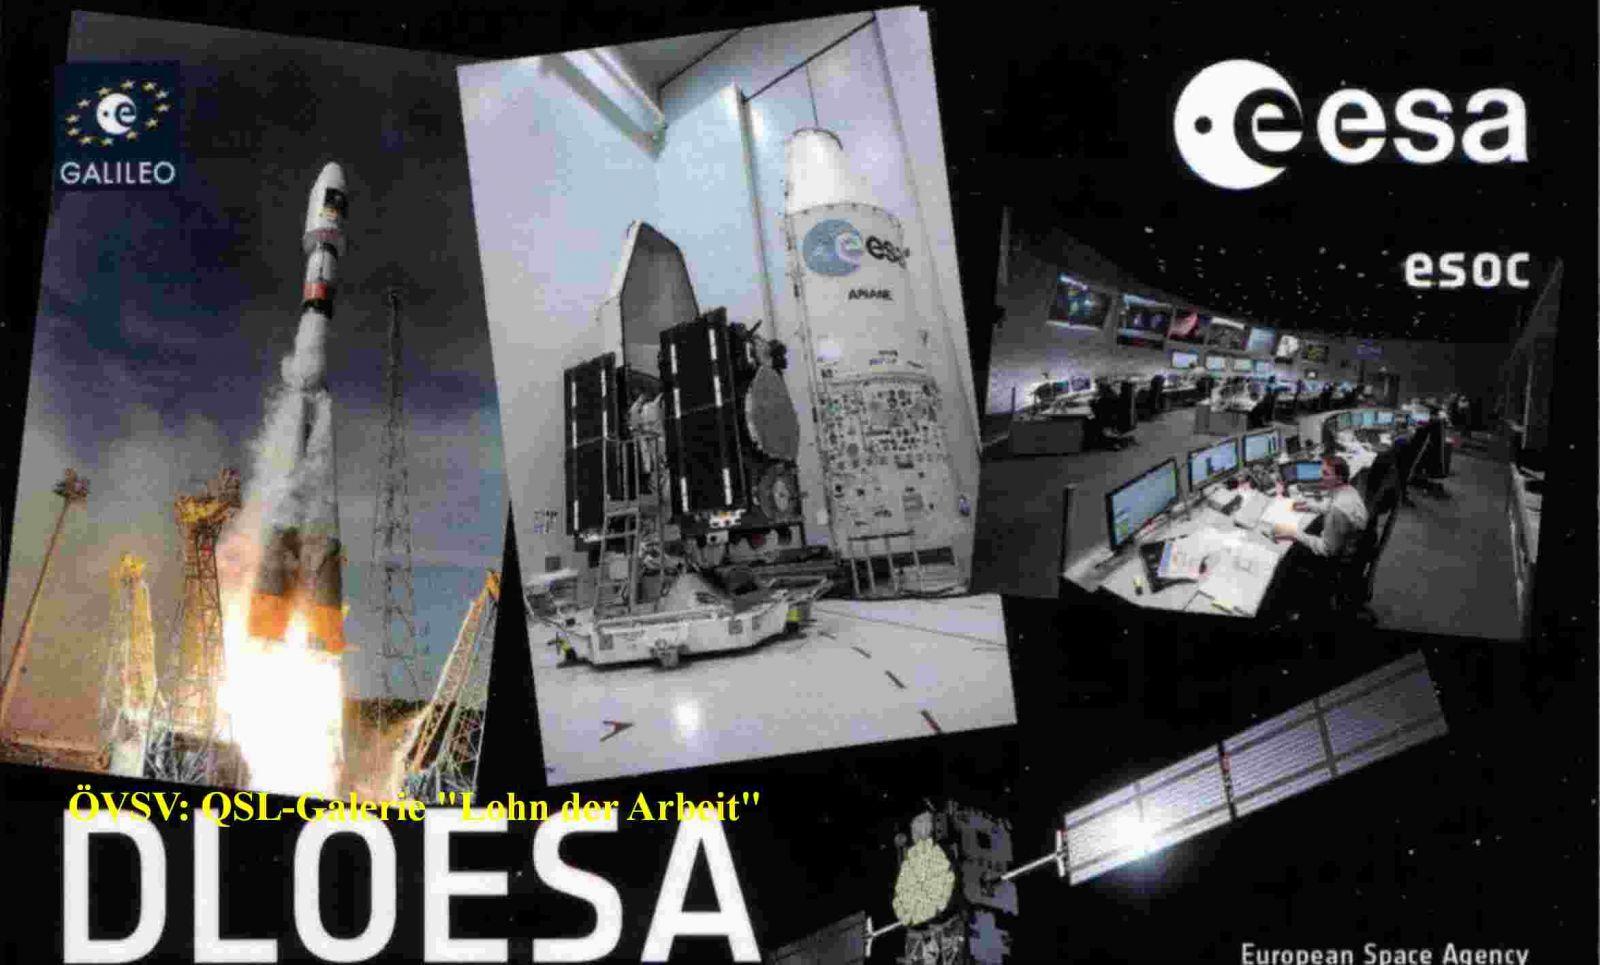 DL0ESA Galileo Activities QSL card